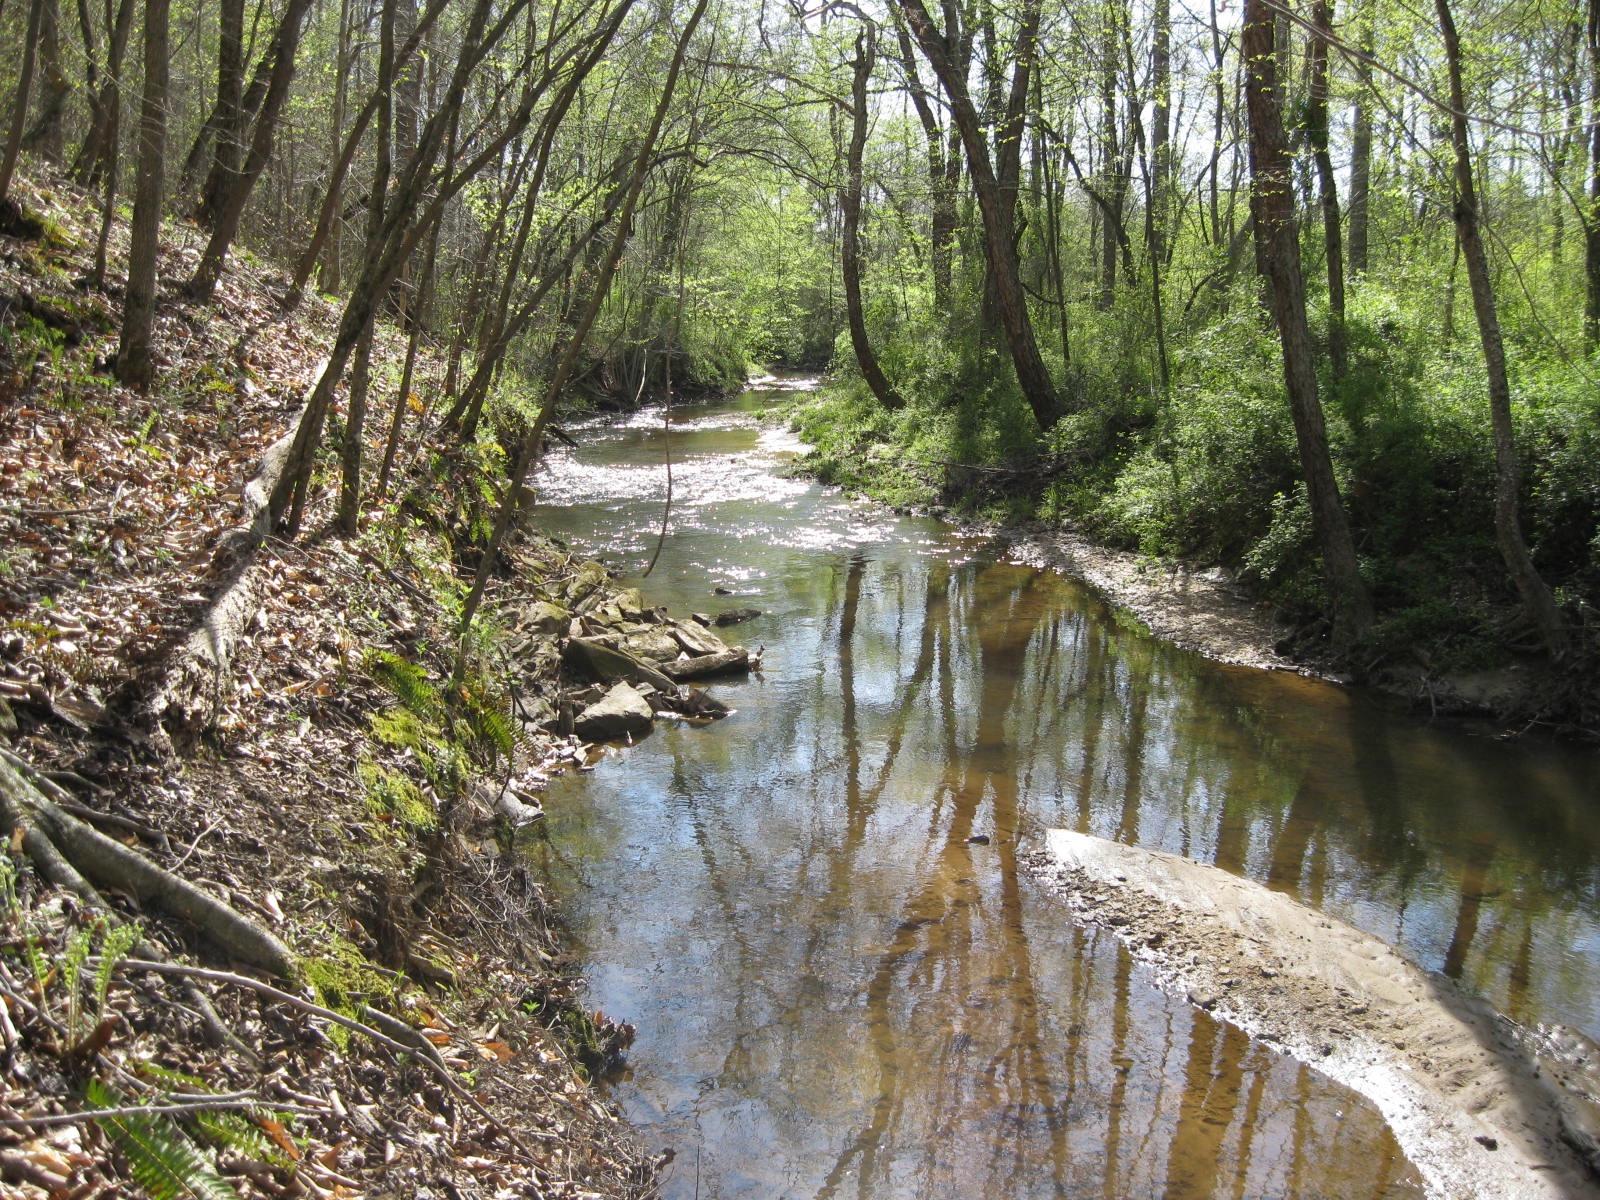 Spring on the creek trail photo tour